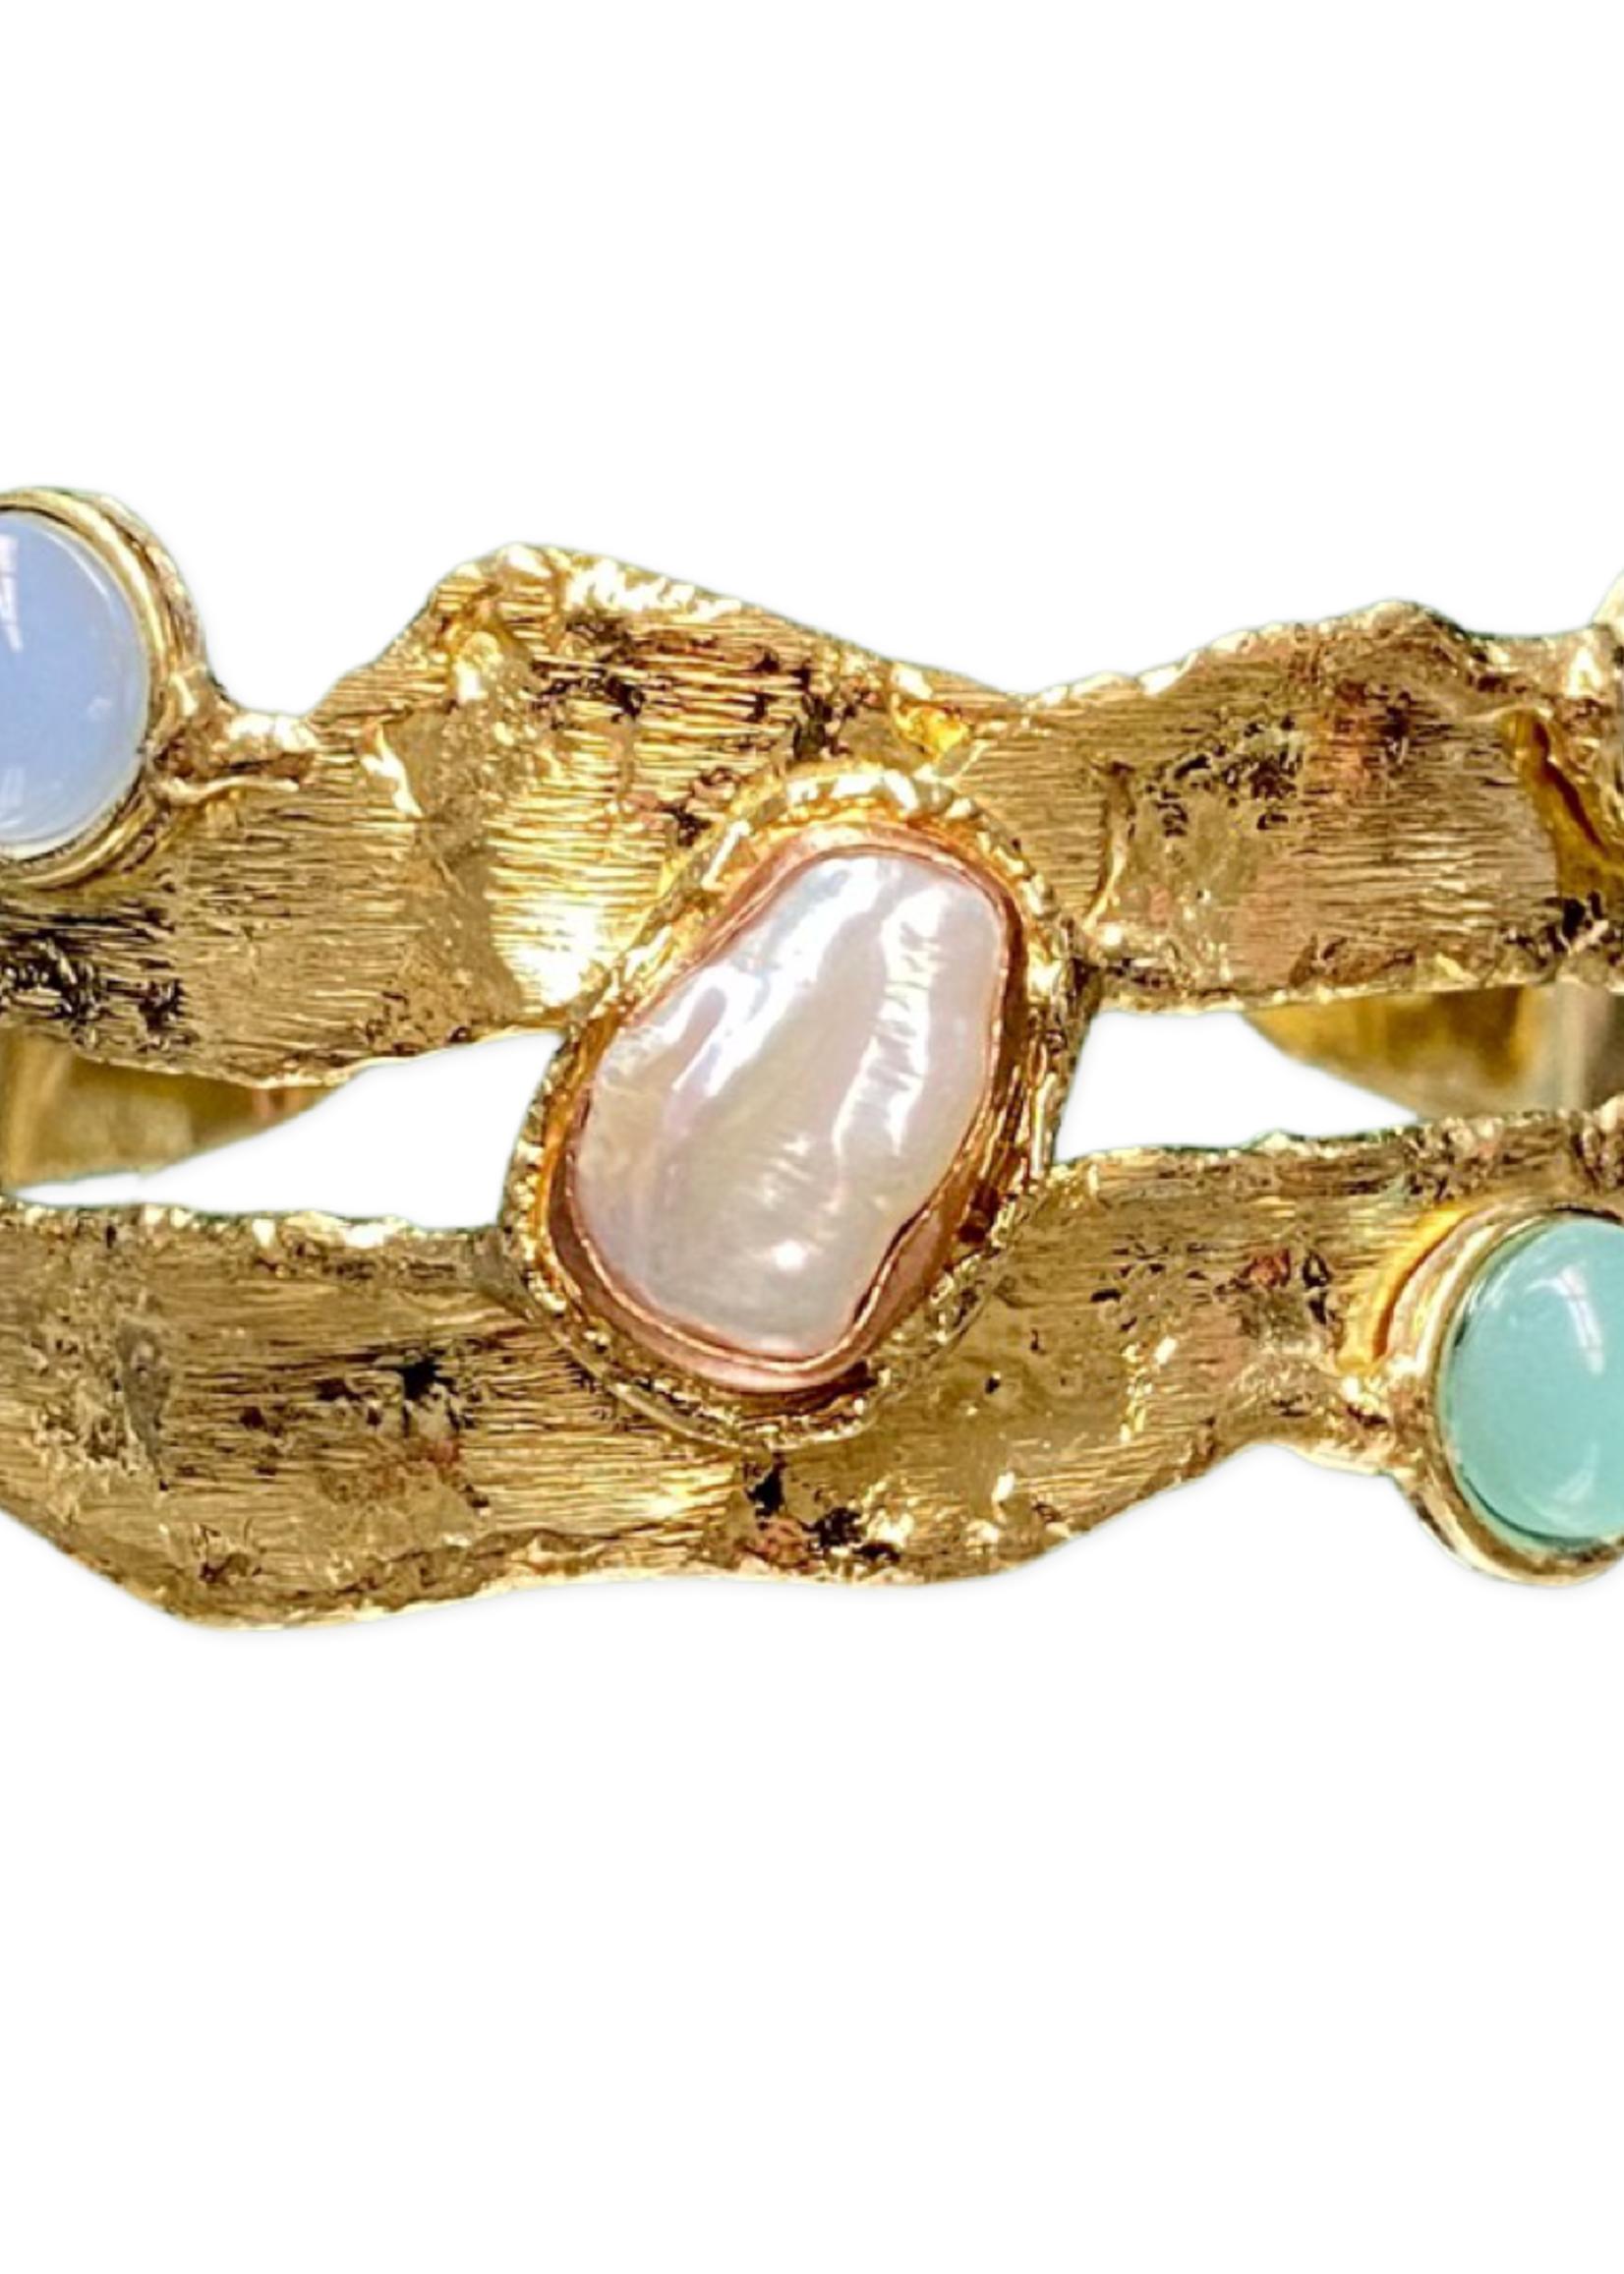 David Jeffery Brass & Copper Cuff w Aqua Marine, Chalcedony & pearls